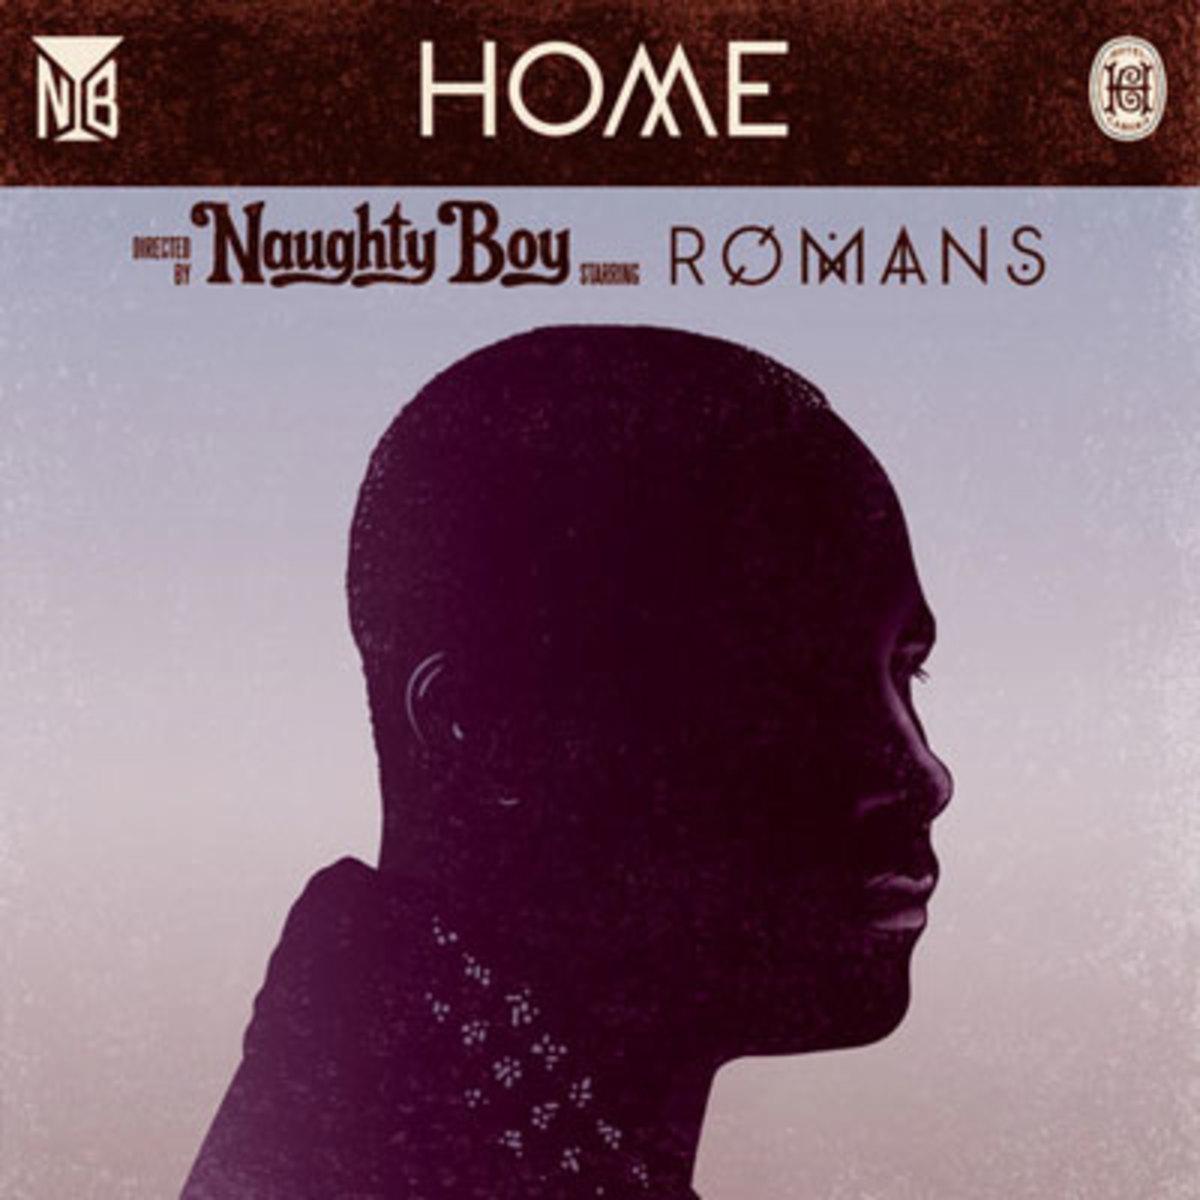 naughtyboy-home.jpg